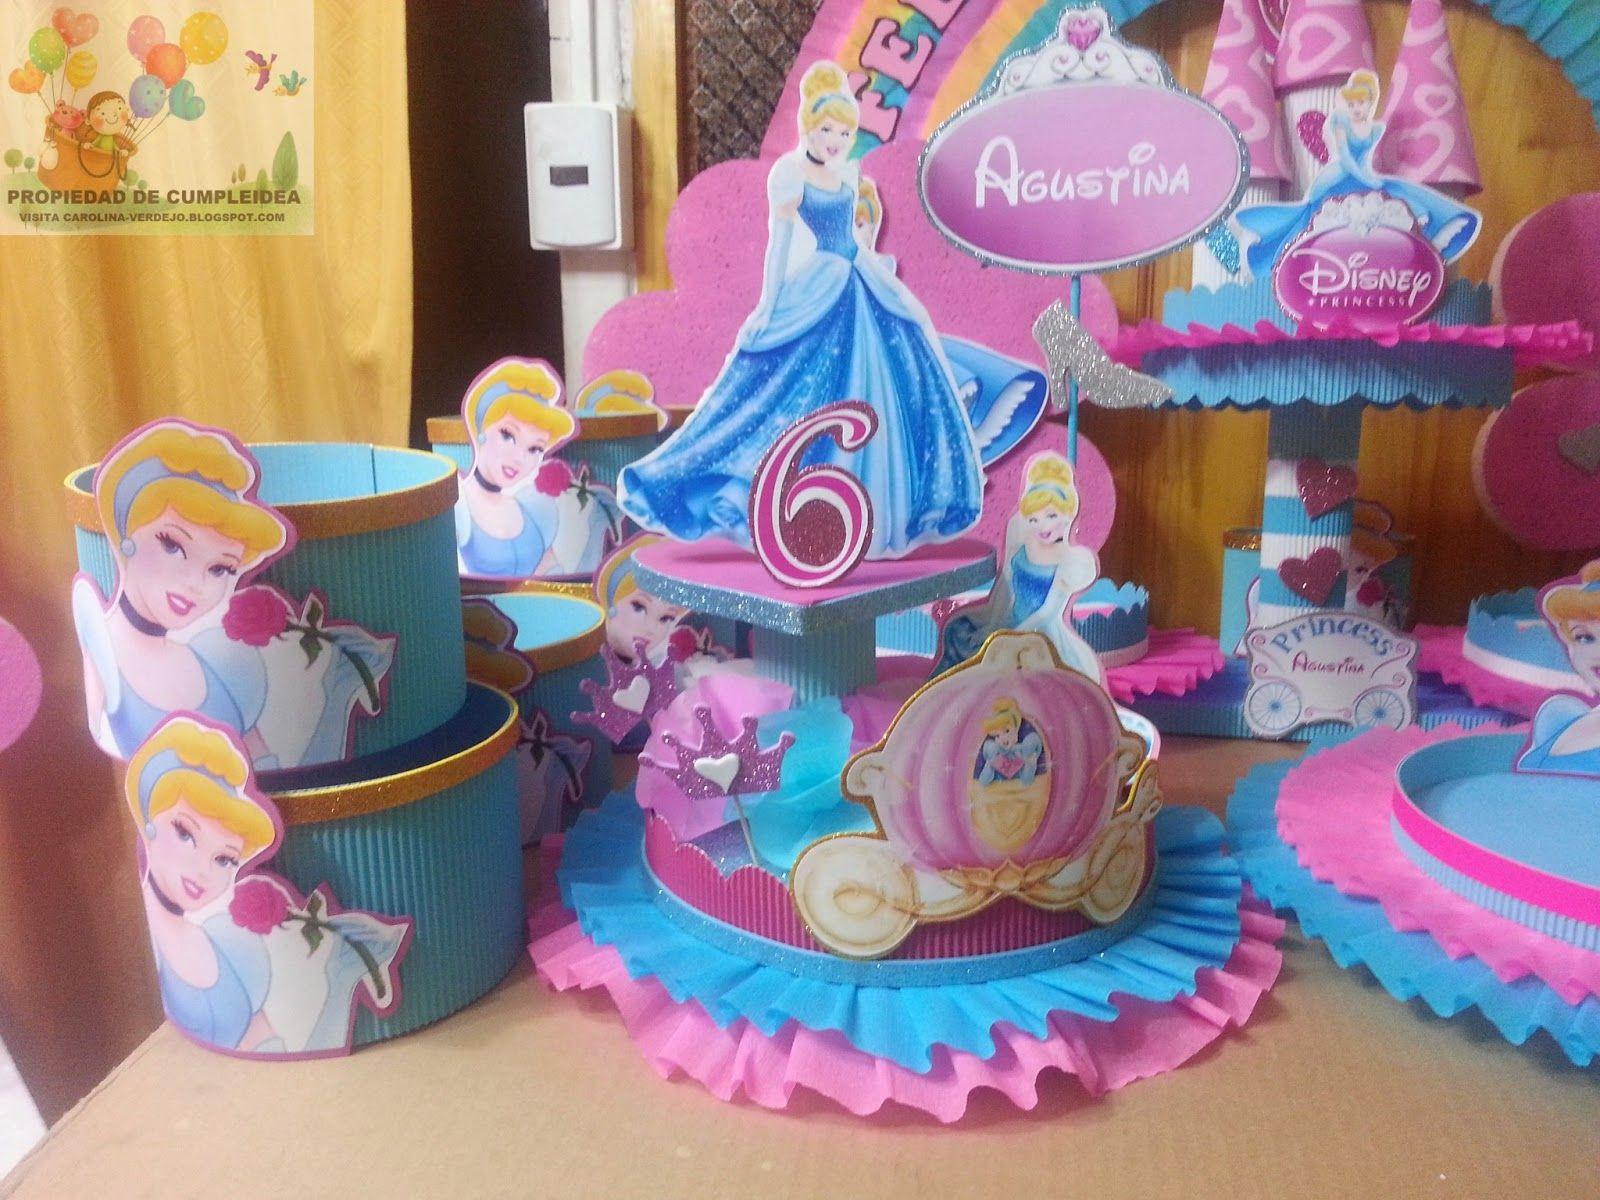 Carolina verdejo decoraciones infantiles google search - Decoracion fiestas infantiles ...